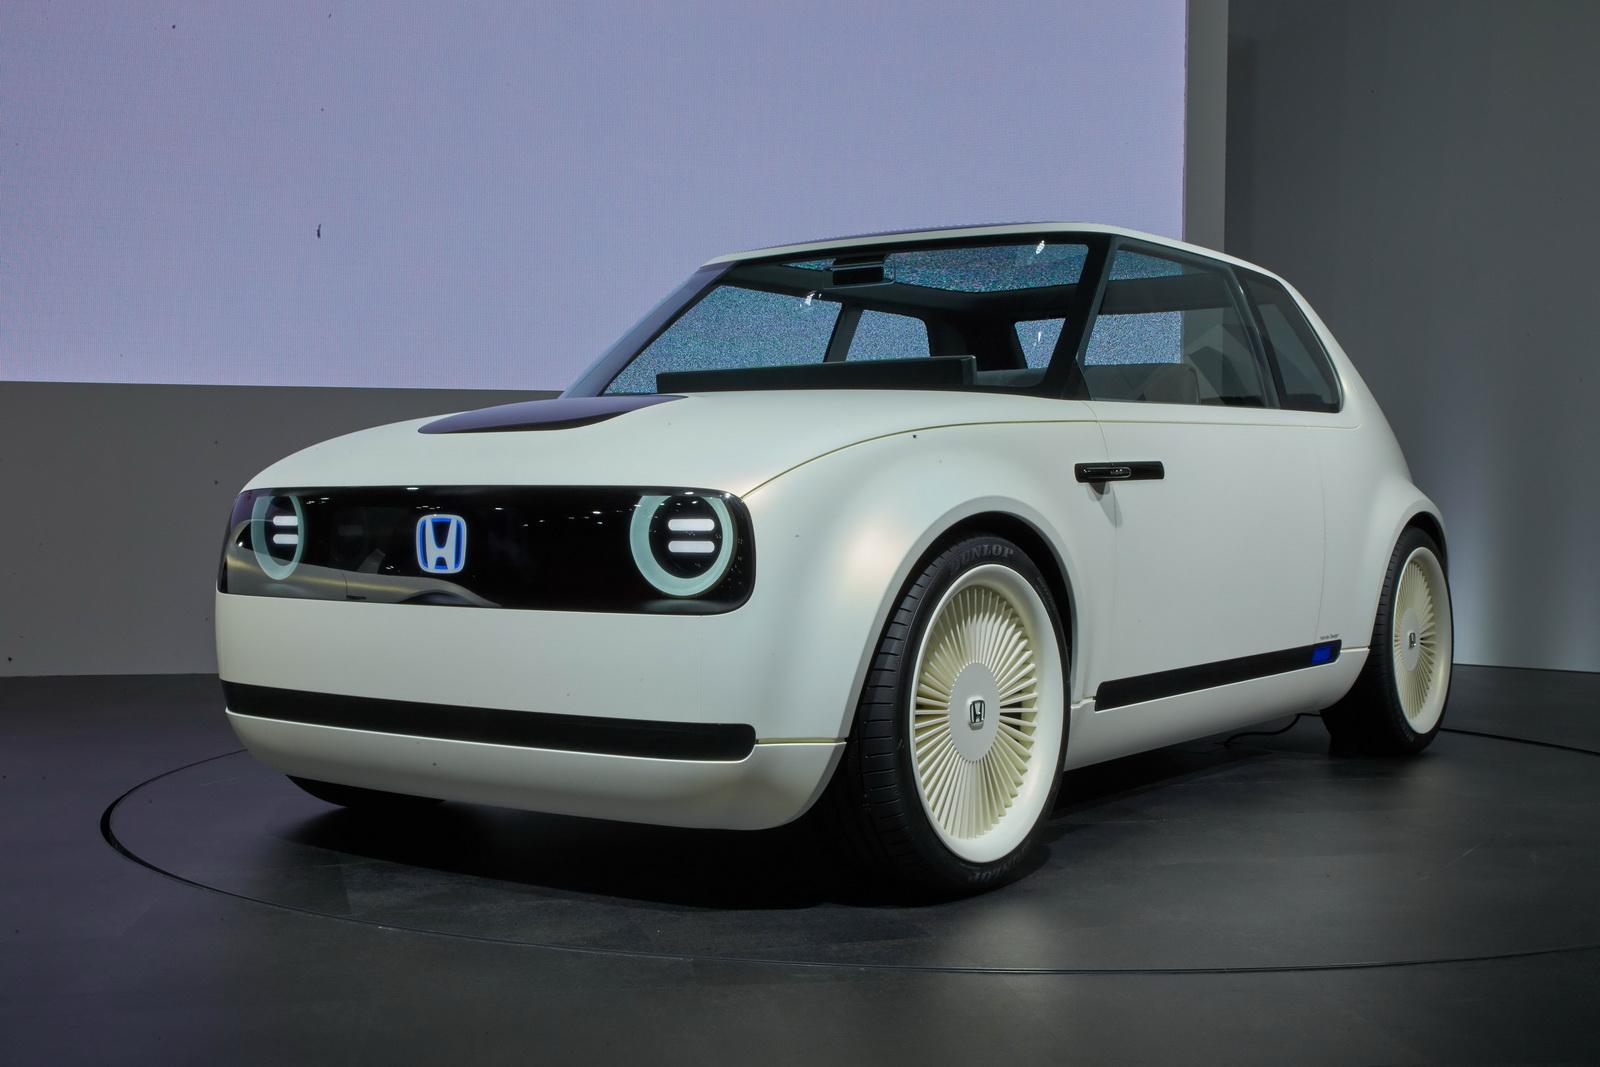 Honda_Urban_EV_Concept_01.jpg